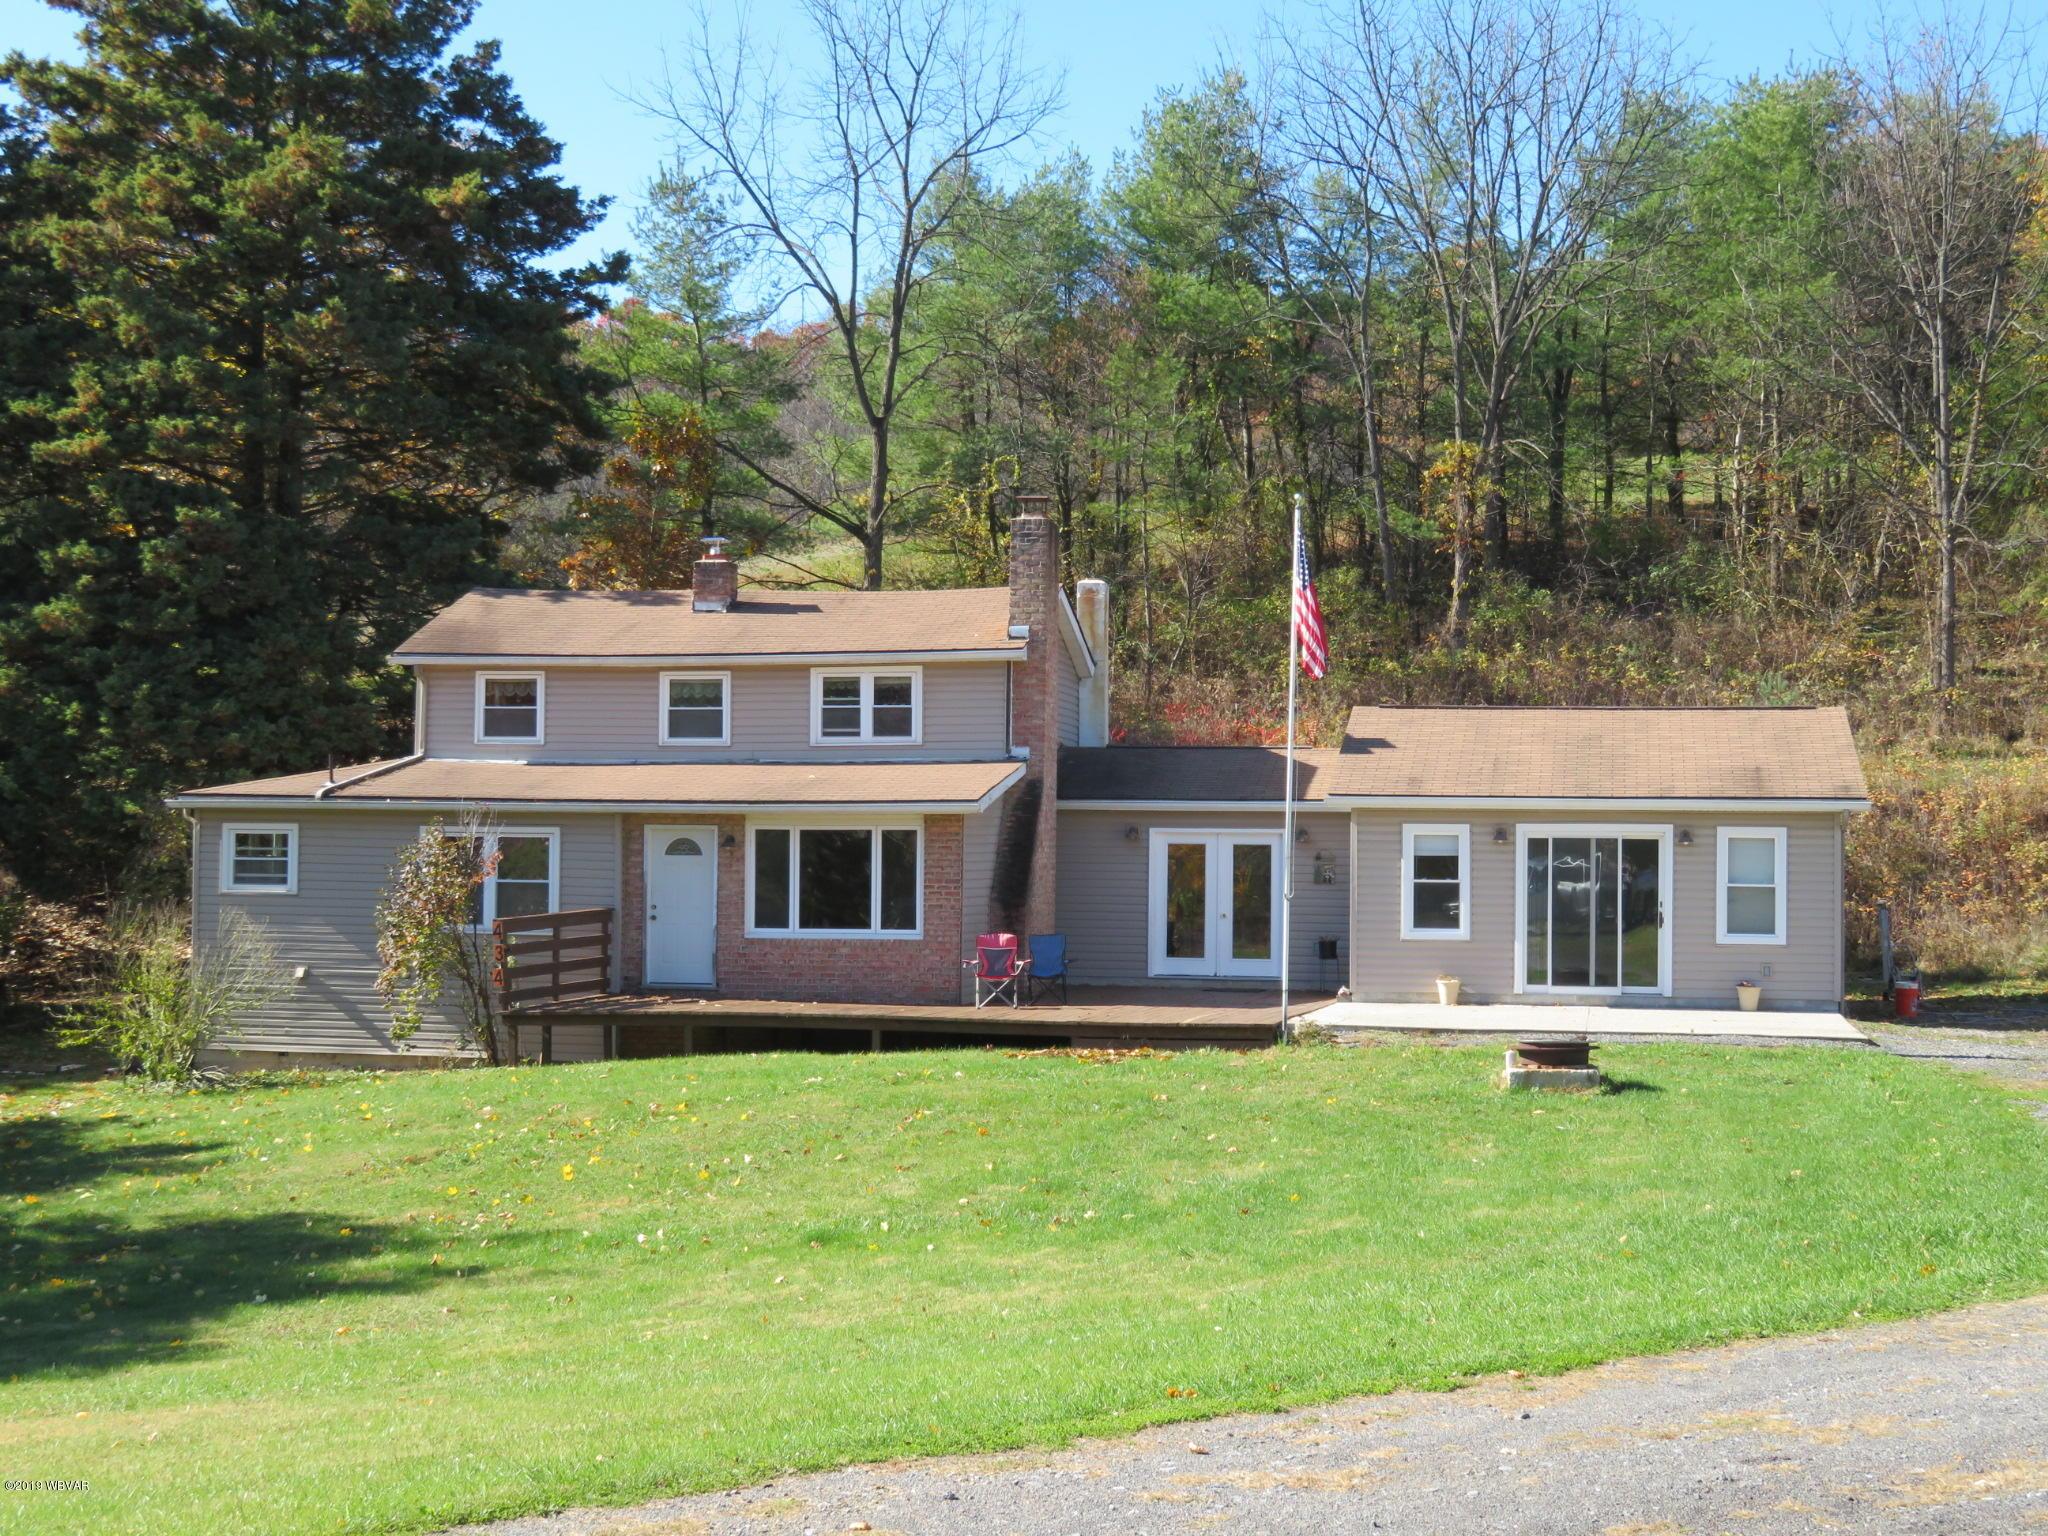 434 MYERS LANE,Julian,PA 16844,3 Bedrooms Bedrooms,1 BathroomBathrooms,Farm,MYERS,WB-89010